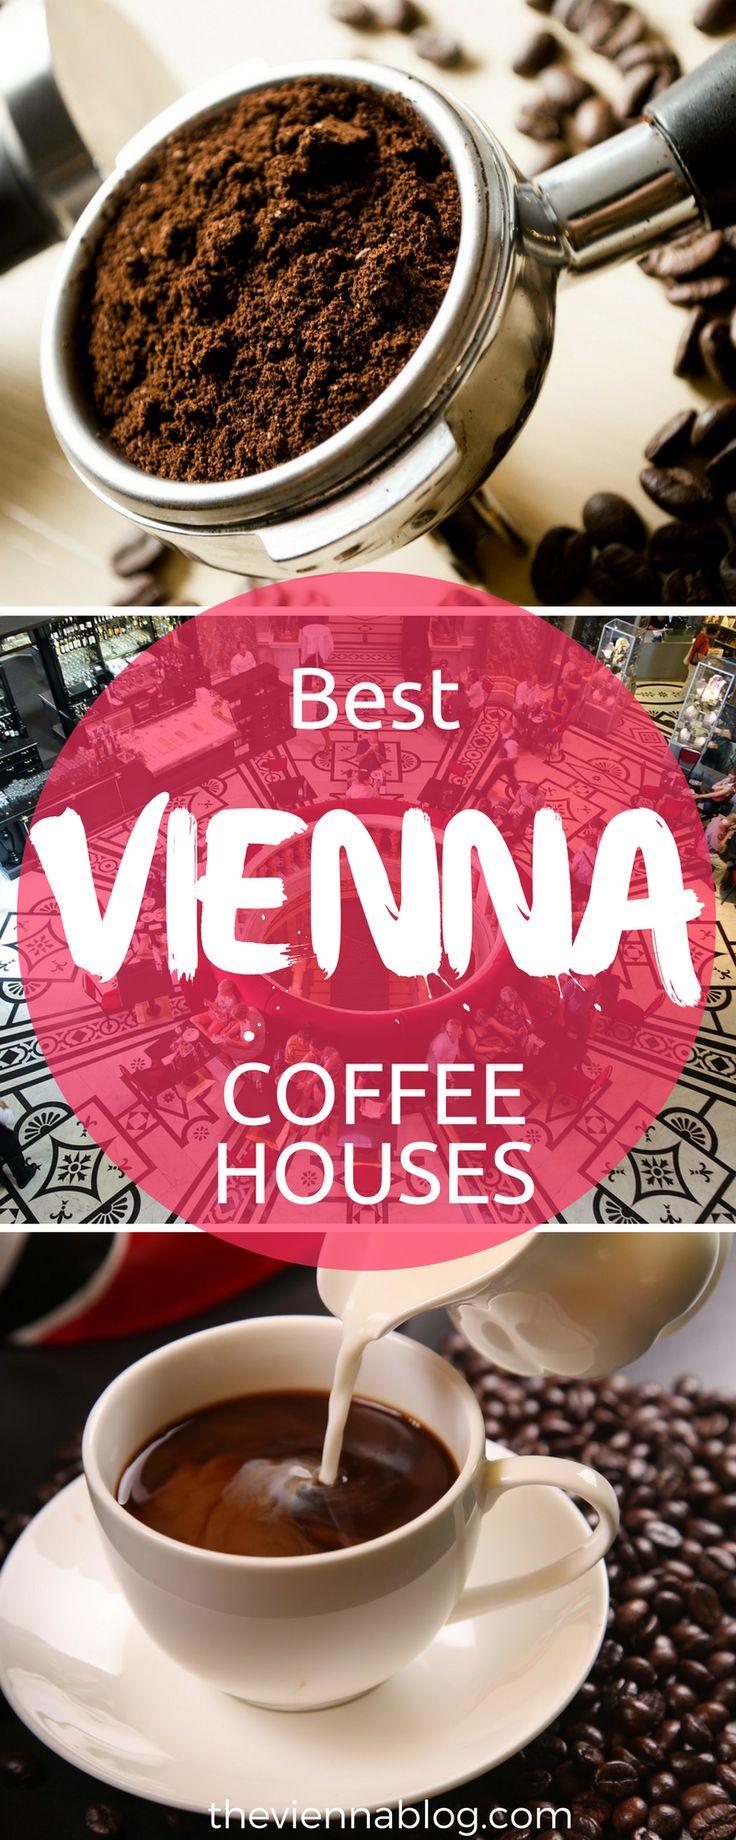 Vienna Best Coffeehouses for Coffee and cakes. #vienna #Wien #Austria #photography  #Opera #vienne #österreich #travleguide #guide #placestovisit #beautifuldestinations #theviennablog #gregsideris #photography #city #hotels #restaurants #urban #destinationguide #traveltips #travelinspiration #vacation #holiday #reisen #Natgeotravel #Traveltheworld #bucketlists #luxurytravel #travellife #traveladdict #europe #wanderlust